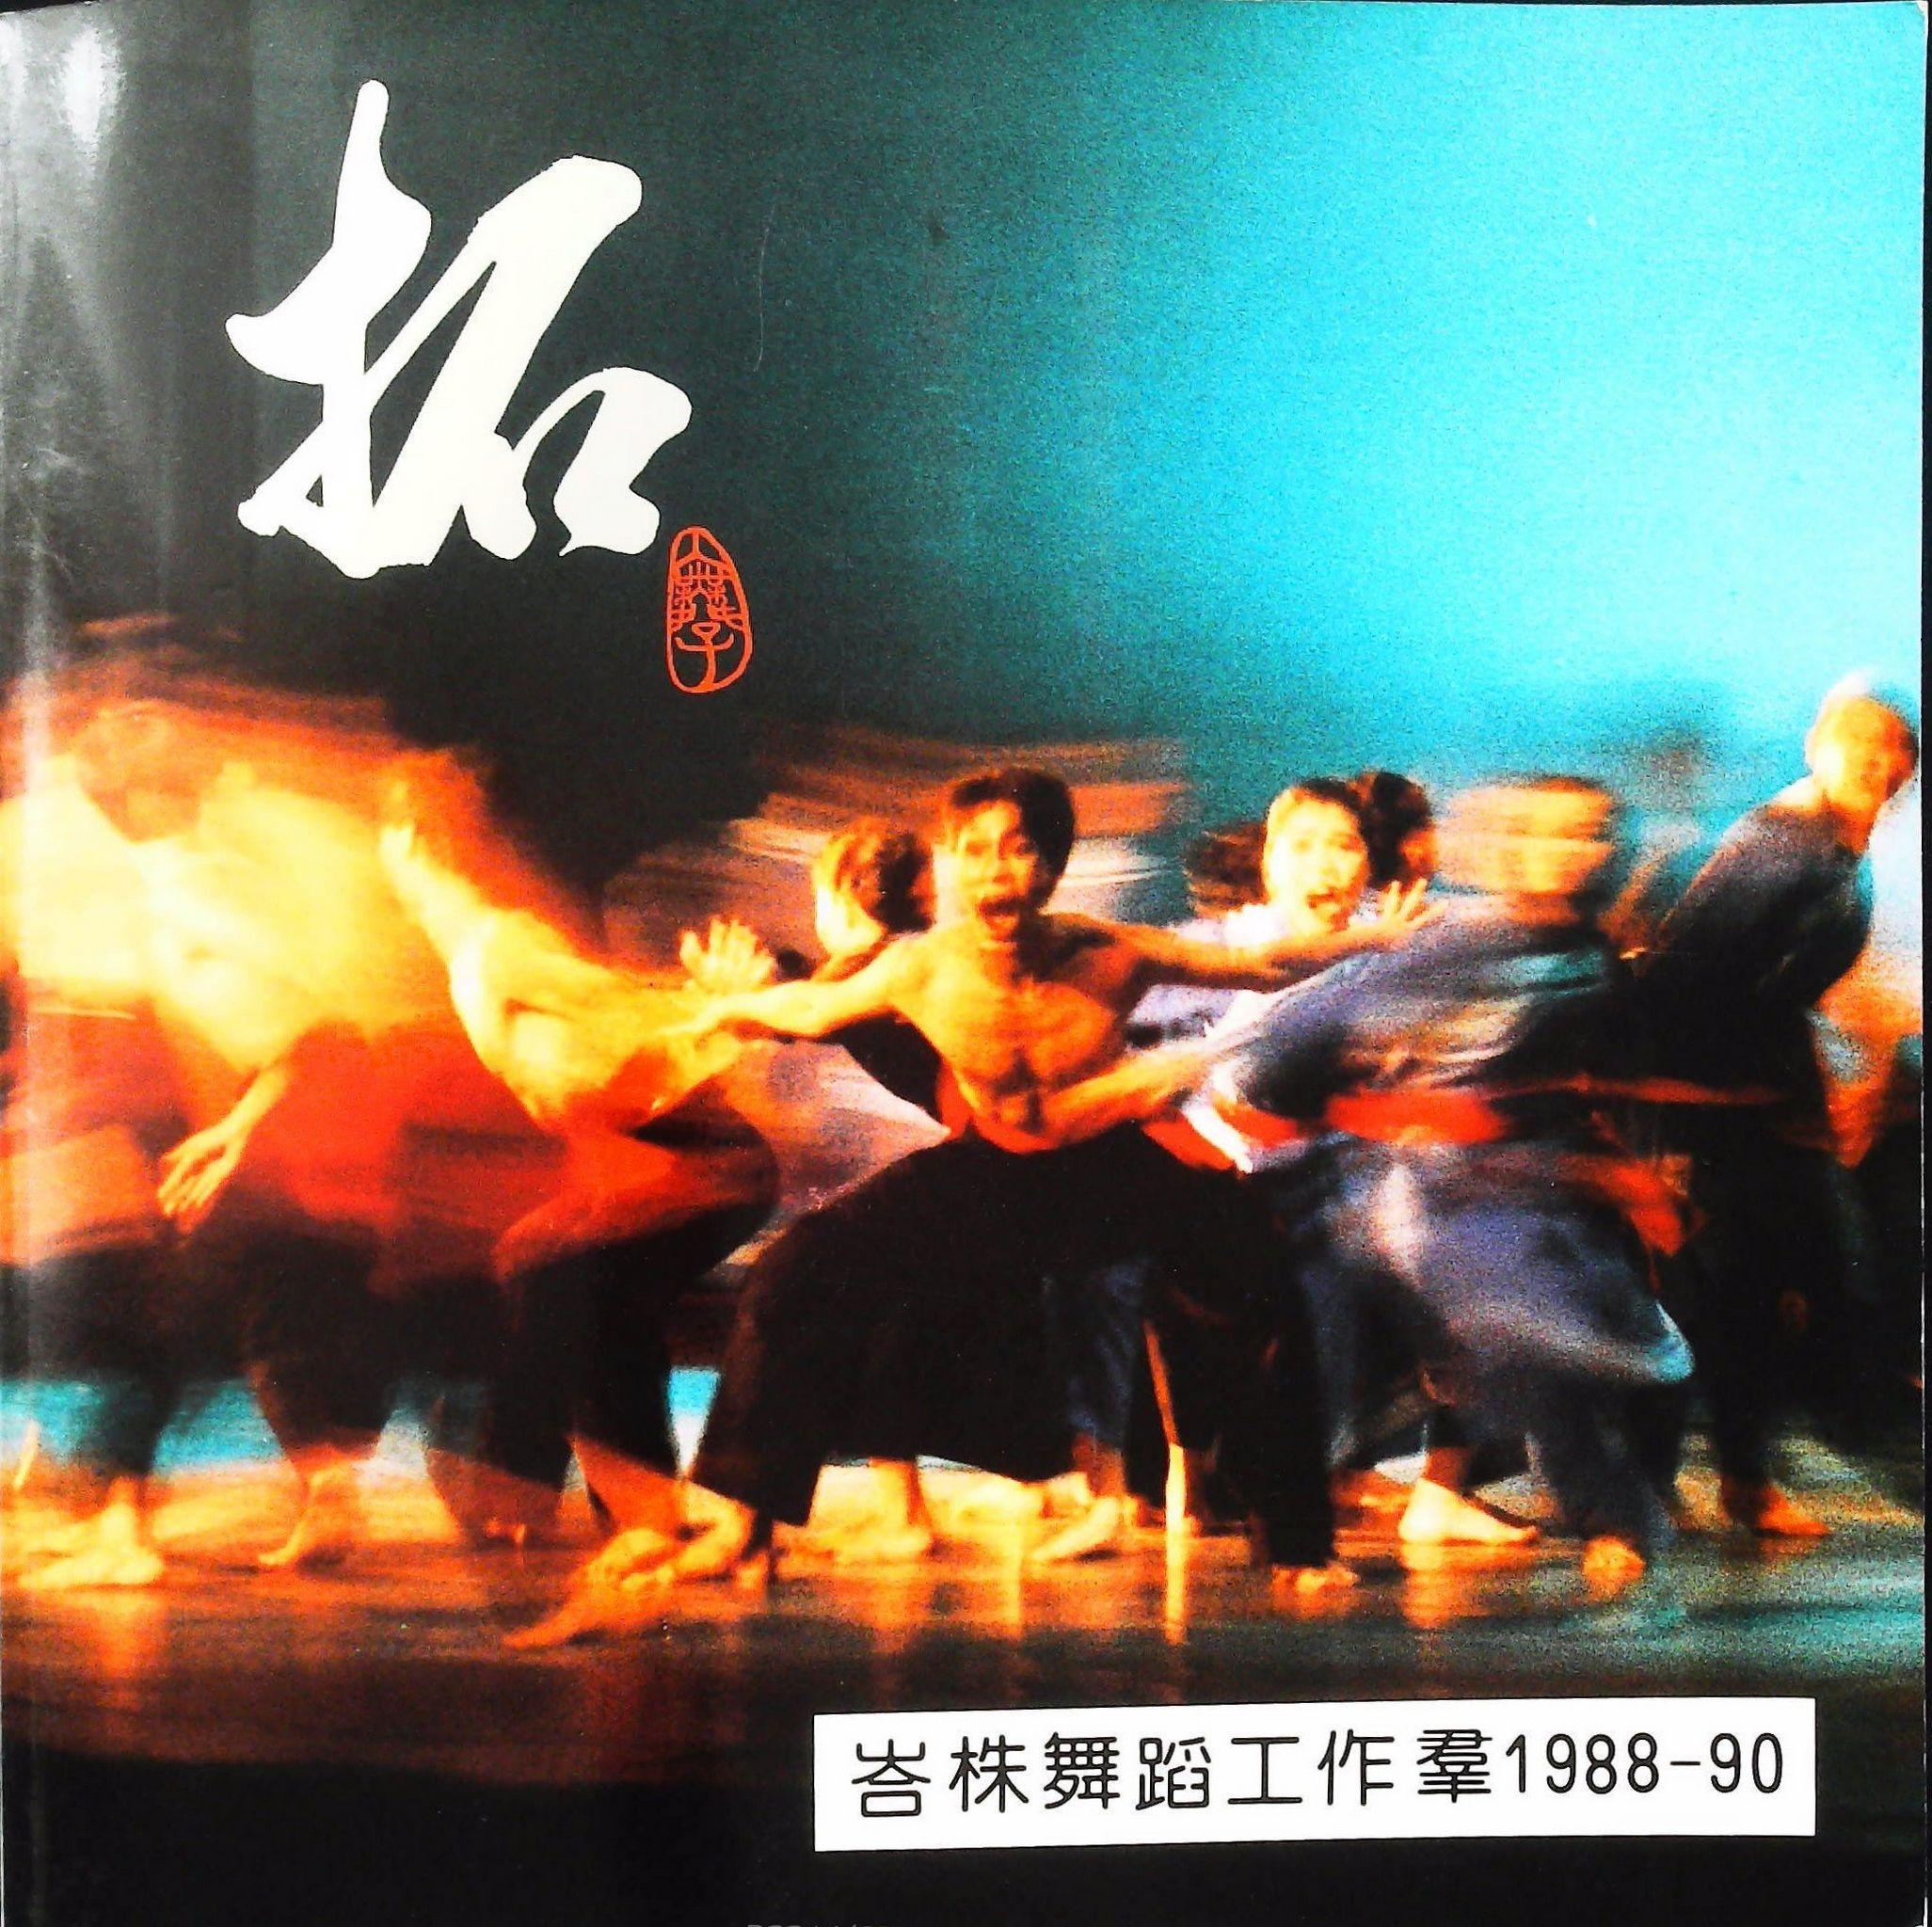 1990 Tuo Wu Zi Cover